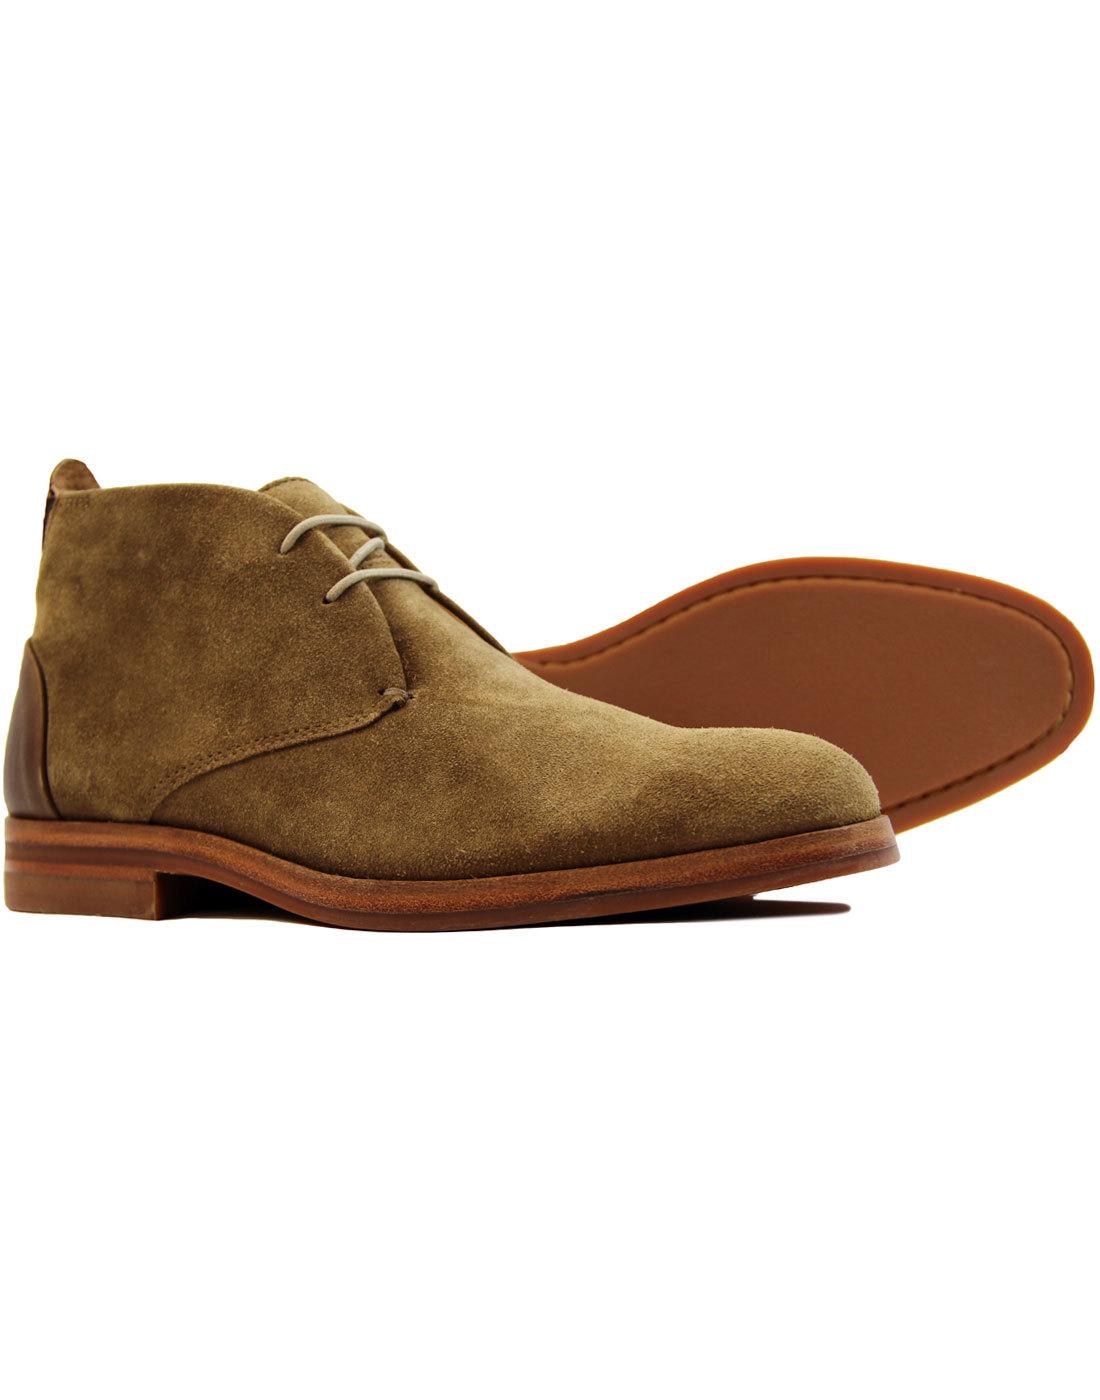 Retro 60s Mod Tobacco Suede Chukka Boots